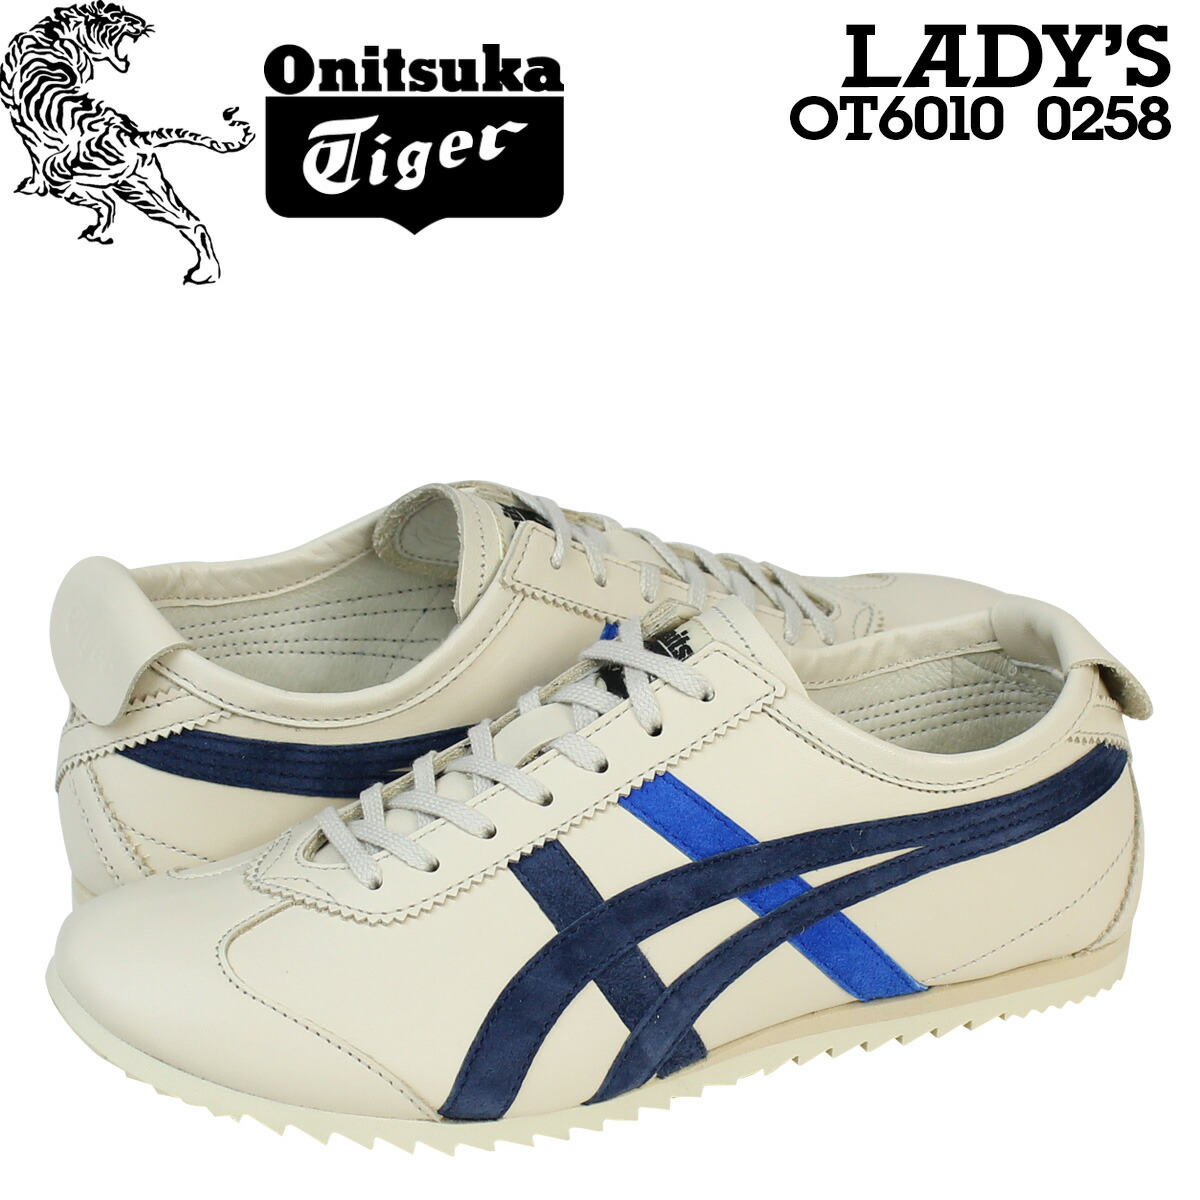 tiger shoes shop online off 53% - www